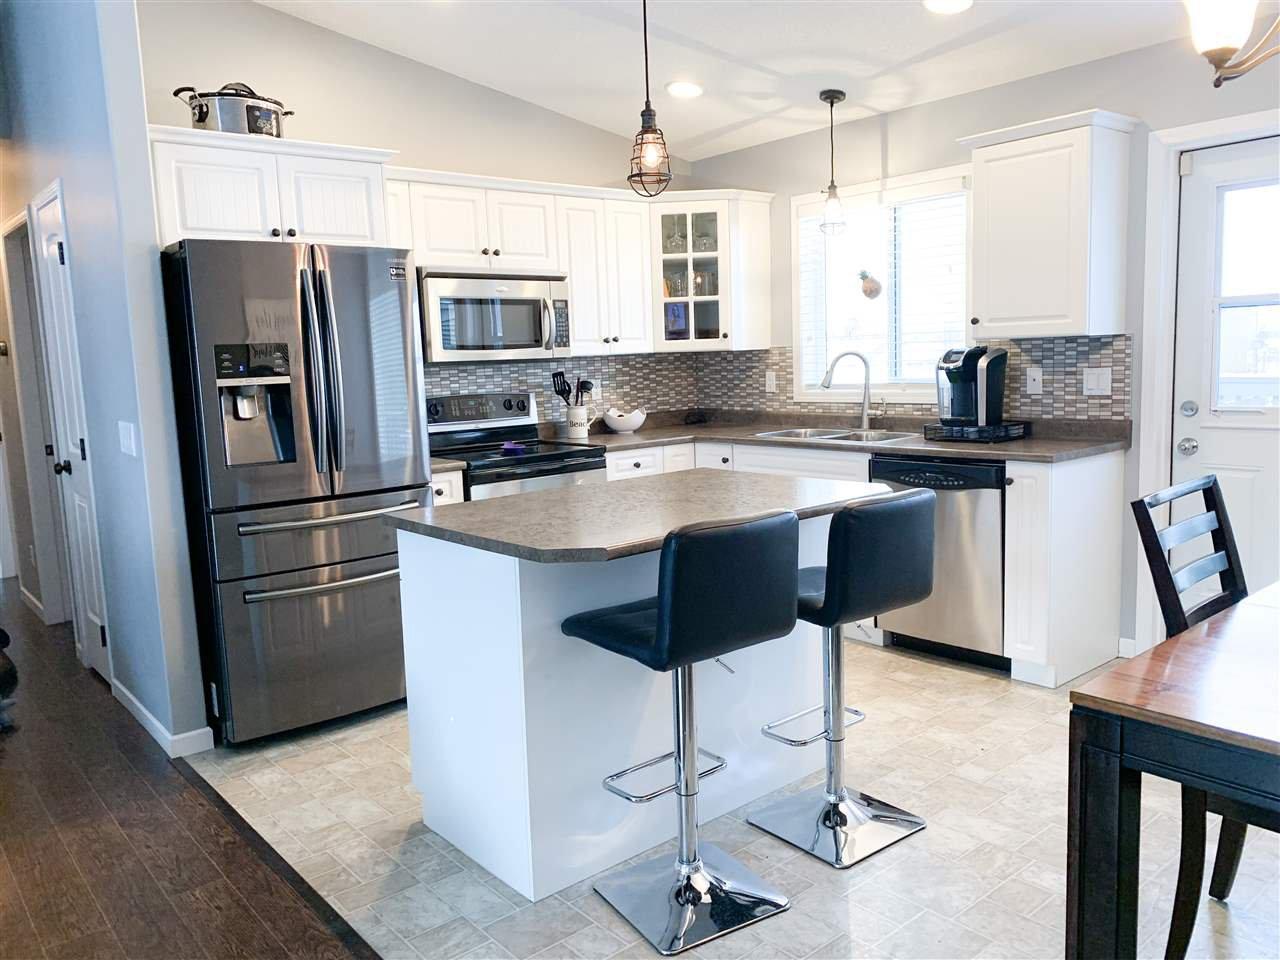 "Photo 2: Photos: 8724 114 Avenue in Fort St. John: Fort St. John - City NE House for sale in ""PANORAMA RIDGE"" (Fort St. John (Zone 60))  : MLS®# R2428633"